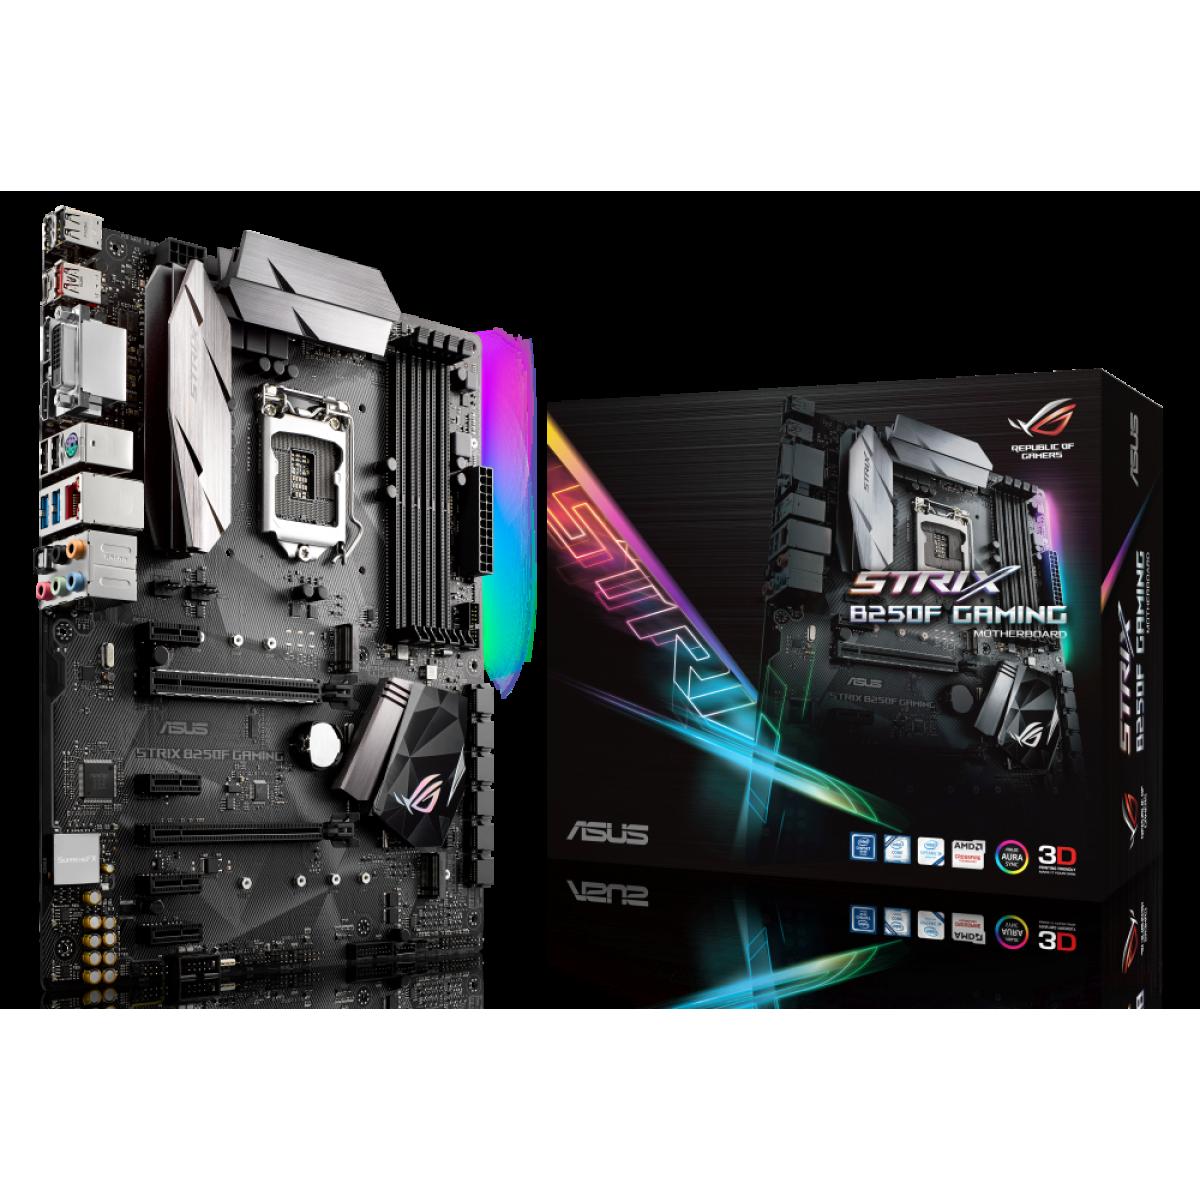 Placa Mãe Asus ROG Strix B250F Gaming, Chipset B250, Intel LGA 1151, ATX, DDR4